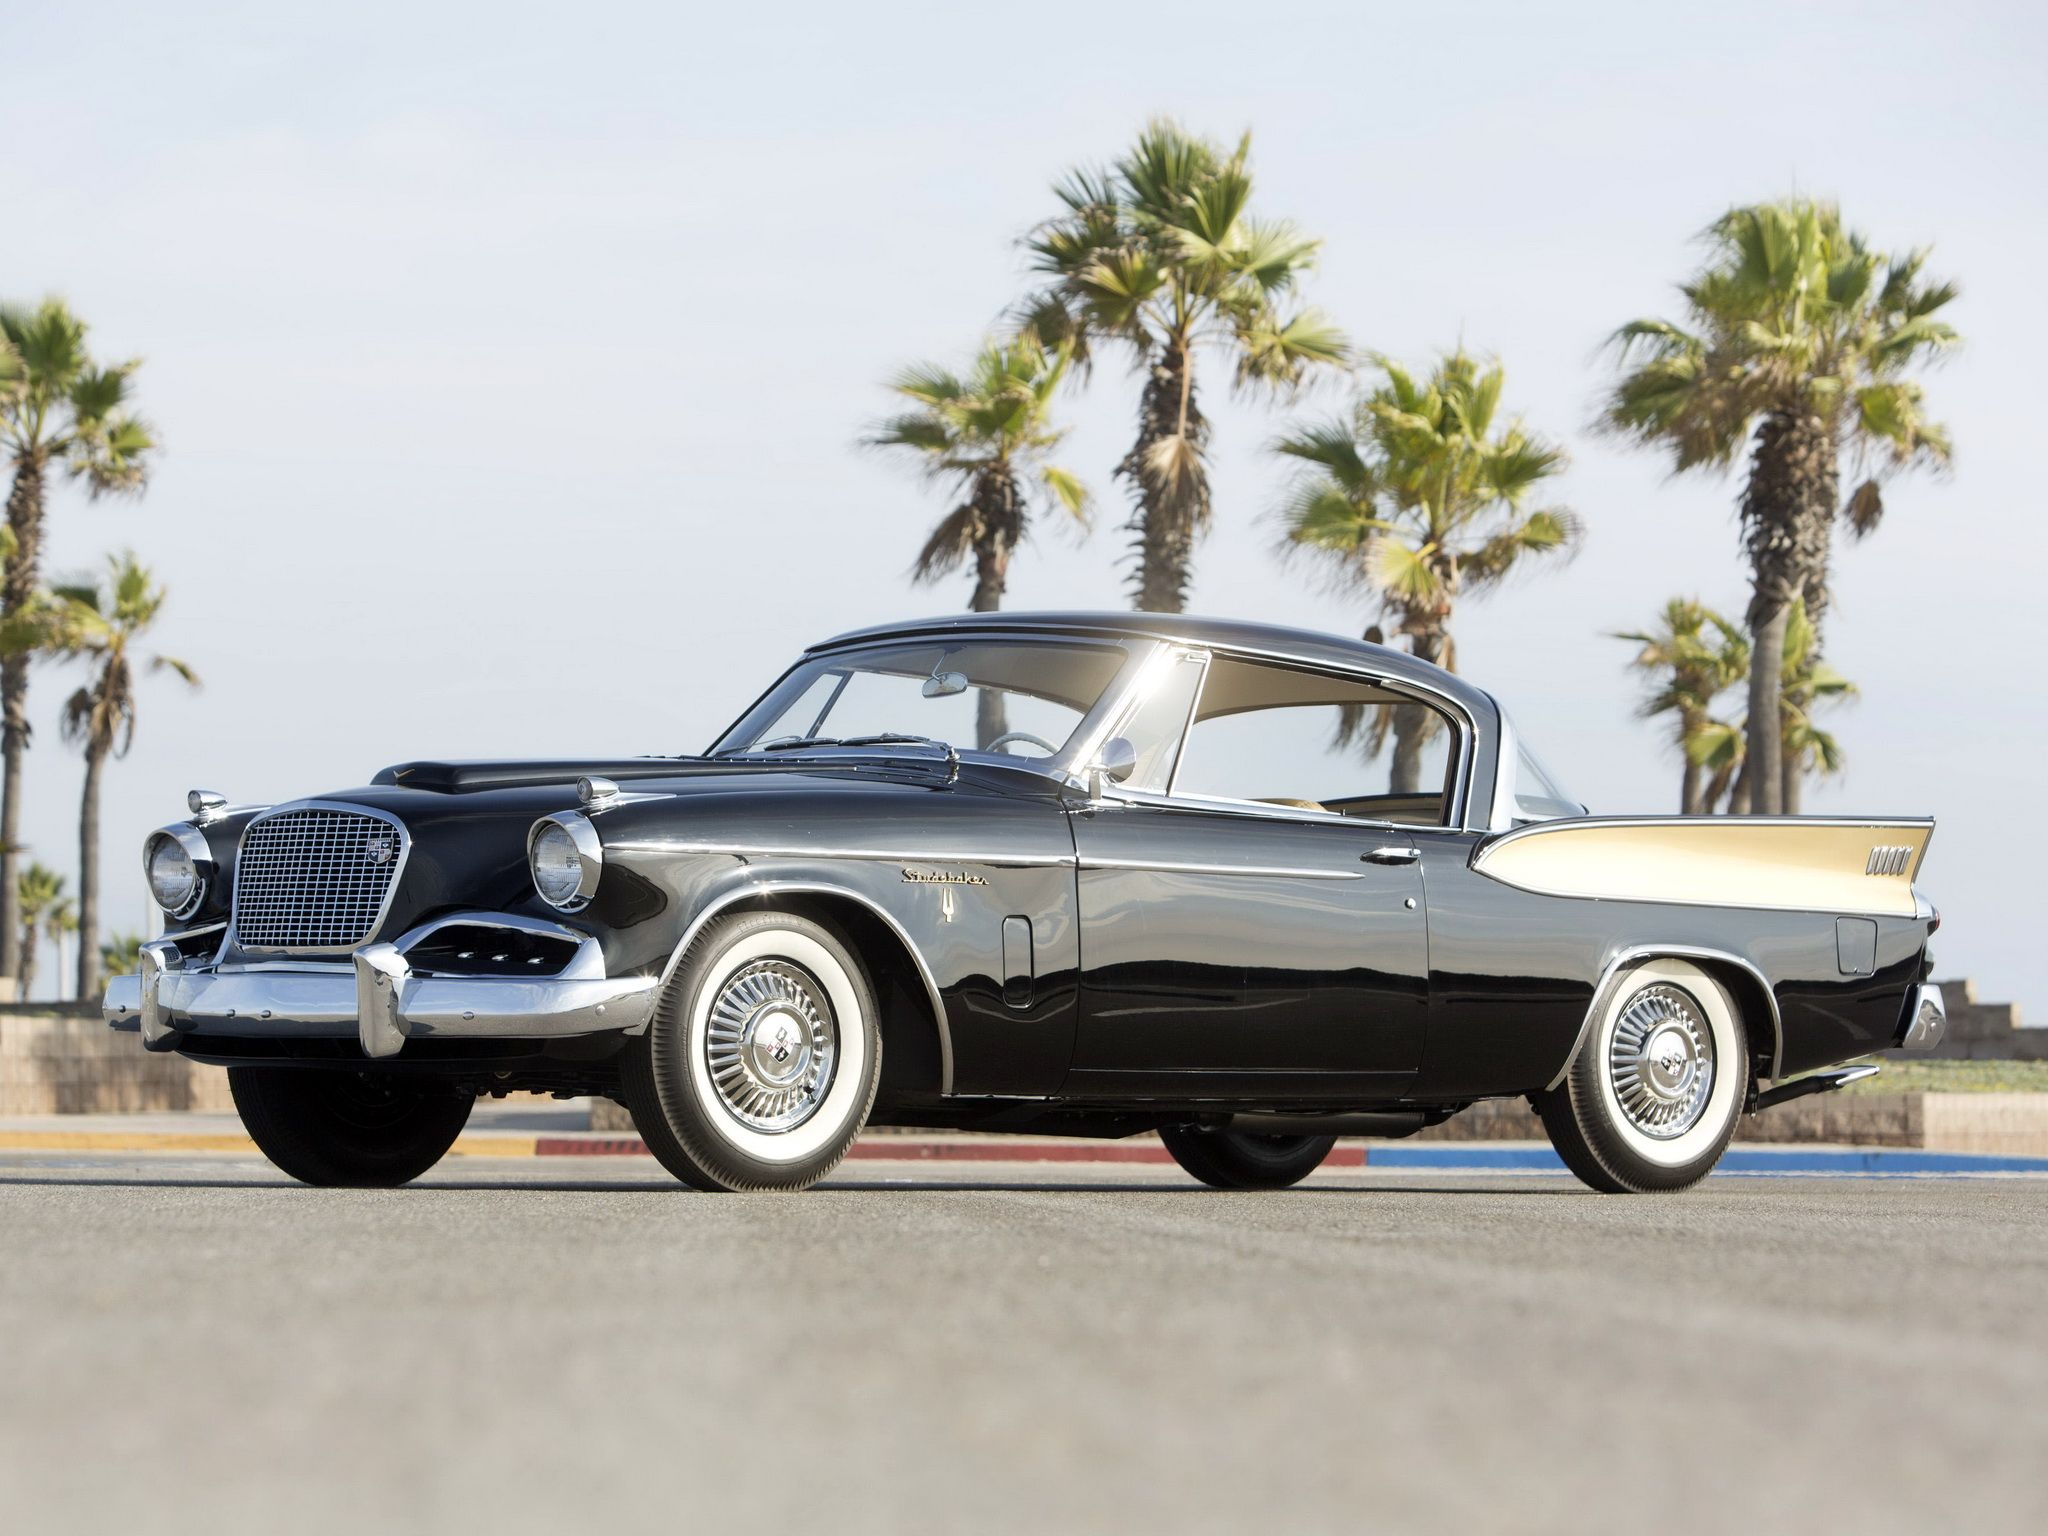 1957 Studebaker Golden Hawk A great classic of automobile design